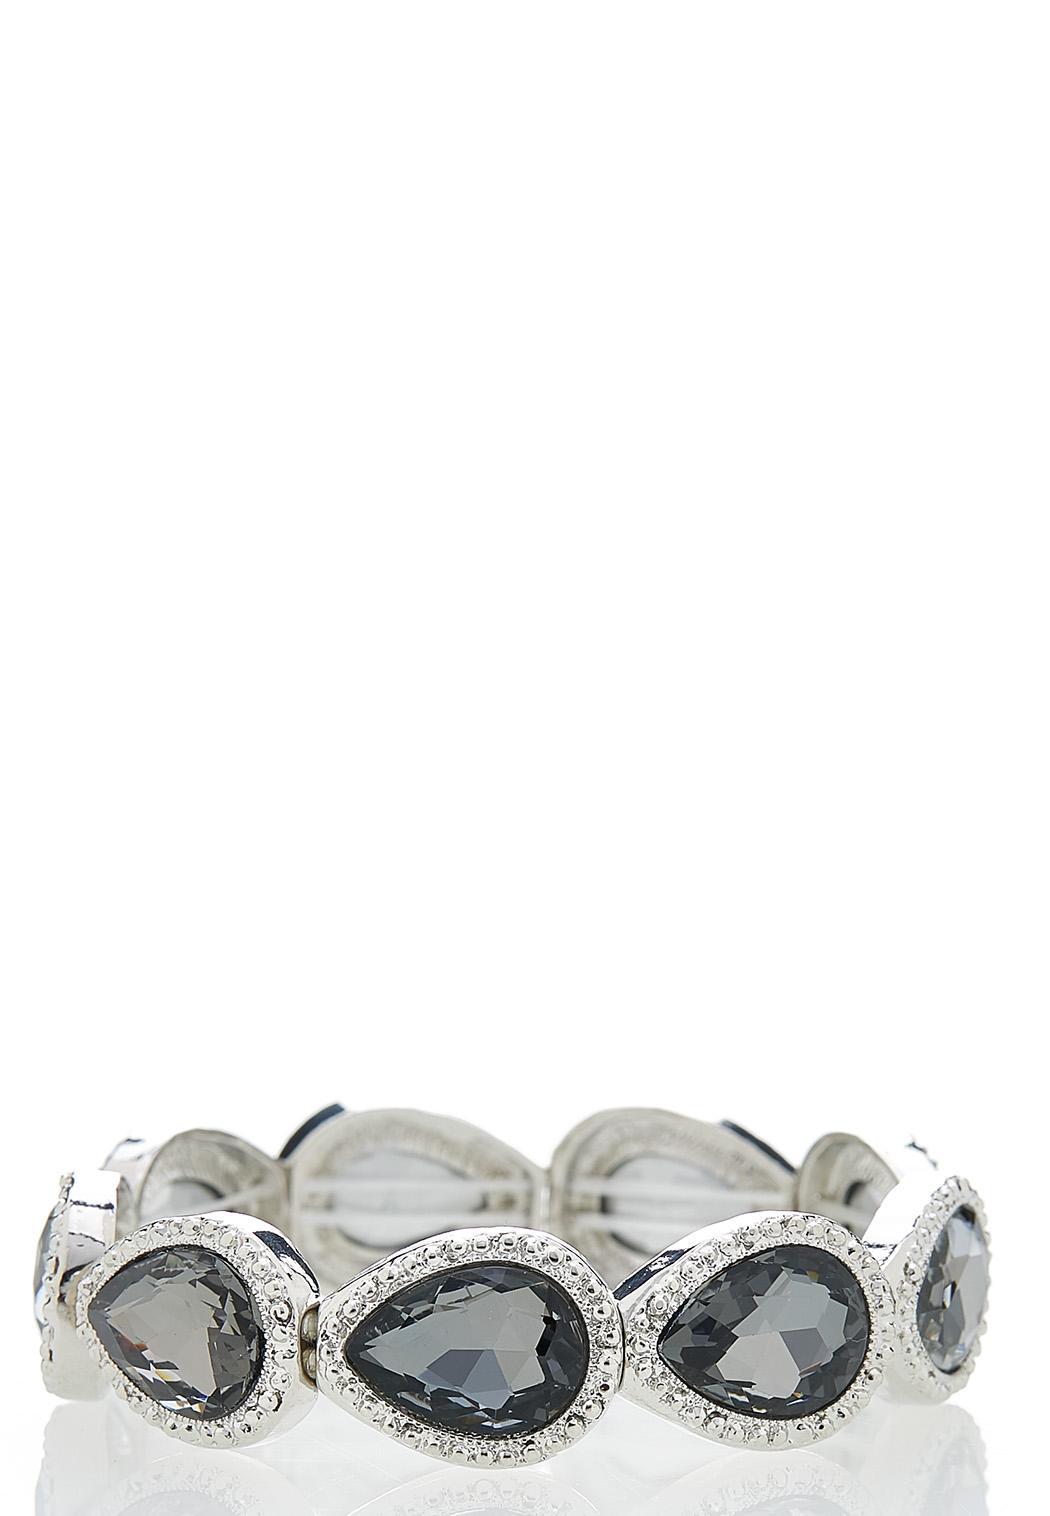 Faceted Glass Stretch Bracelet